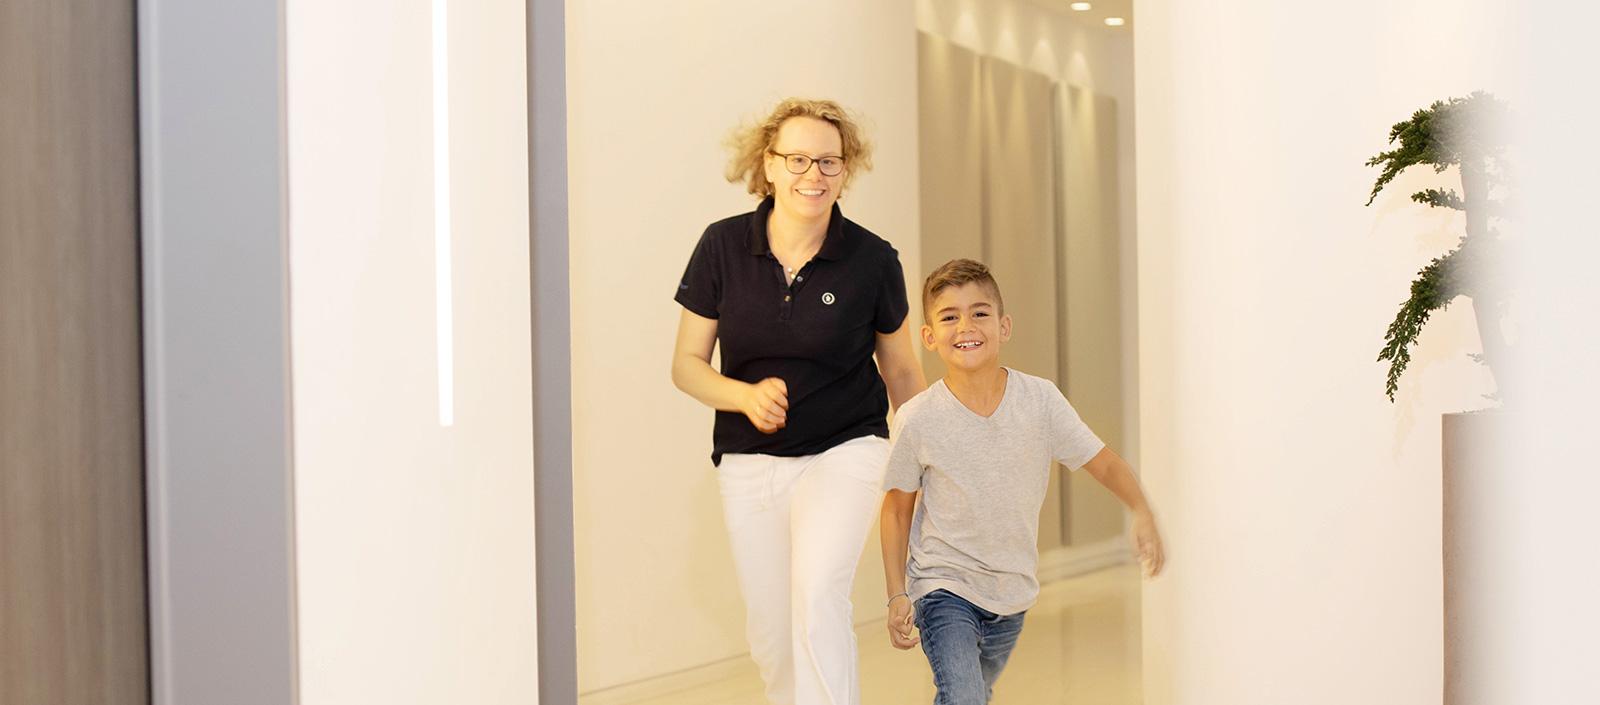 Kinder-Behandlung-beim-Zahnarzt